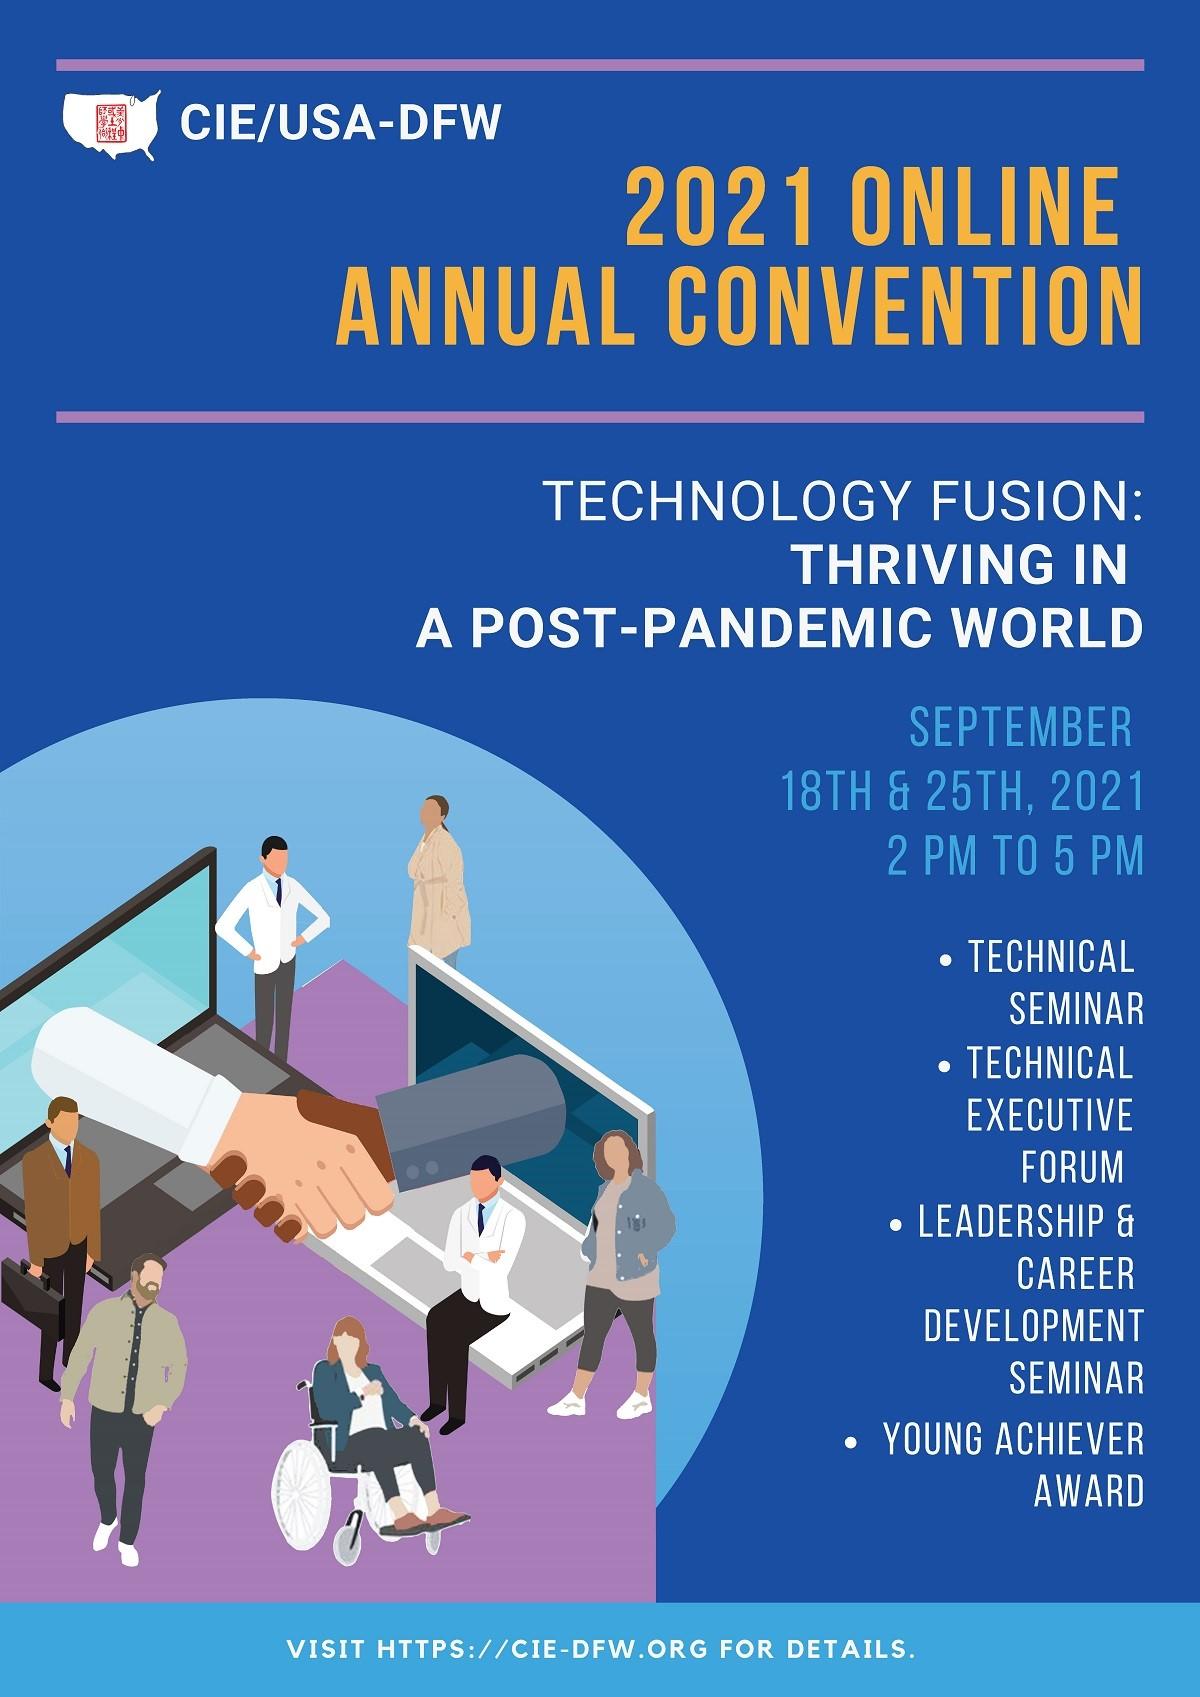 ONLINE: 2021 CIE/USA-DFW Annual Convention